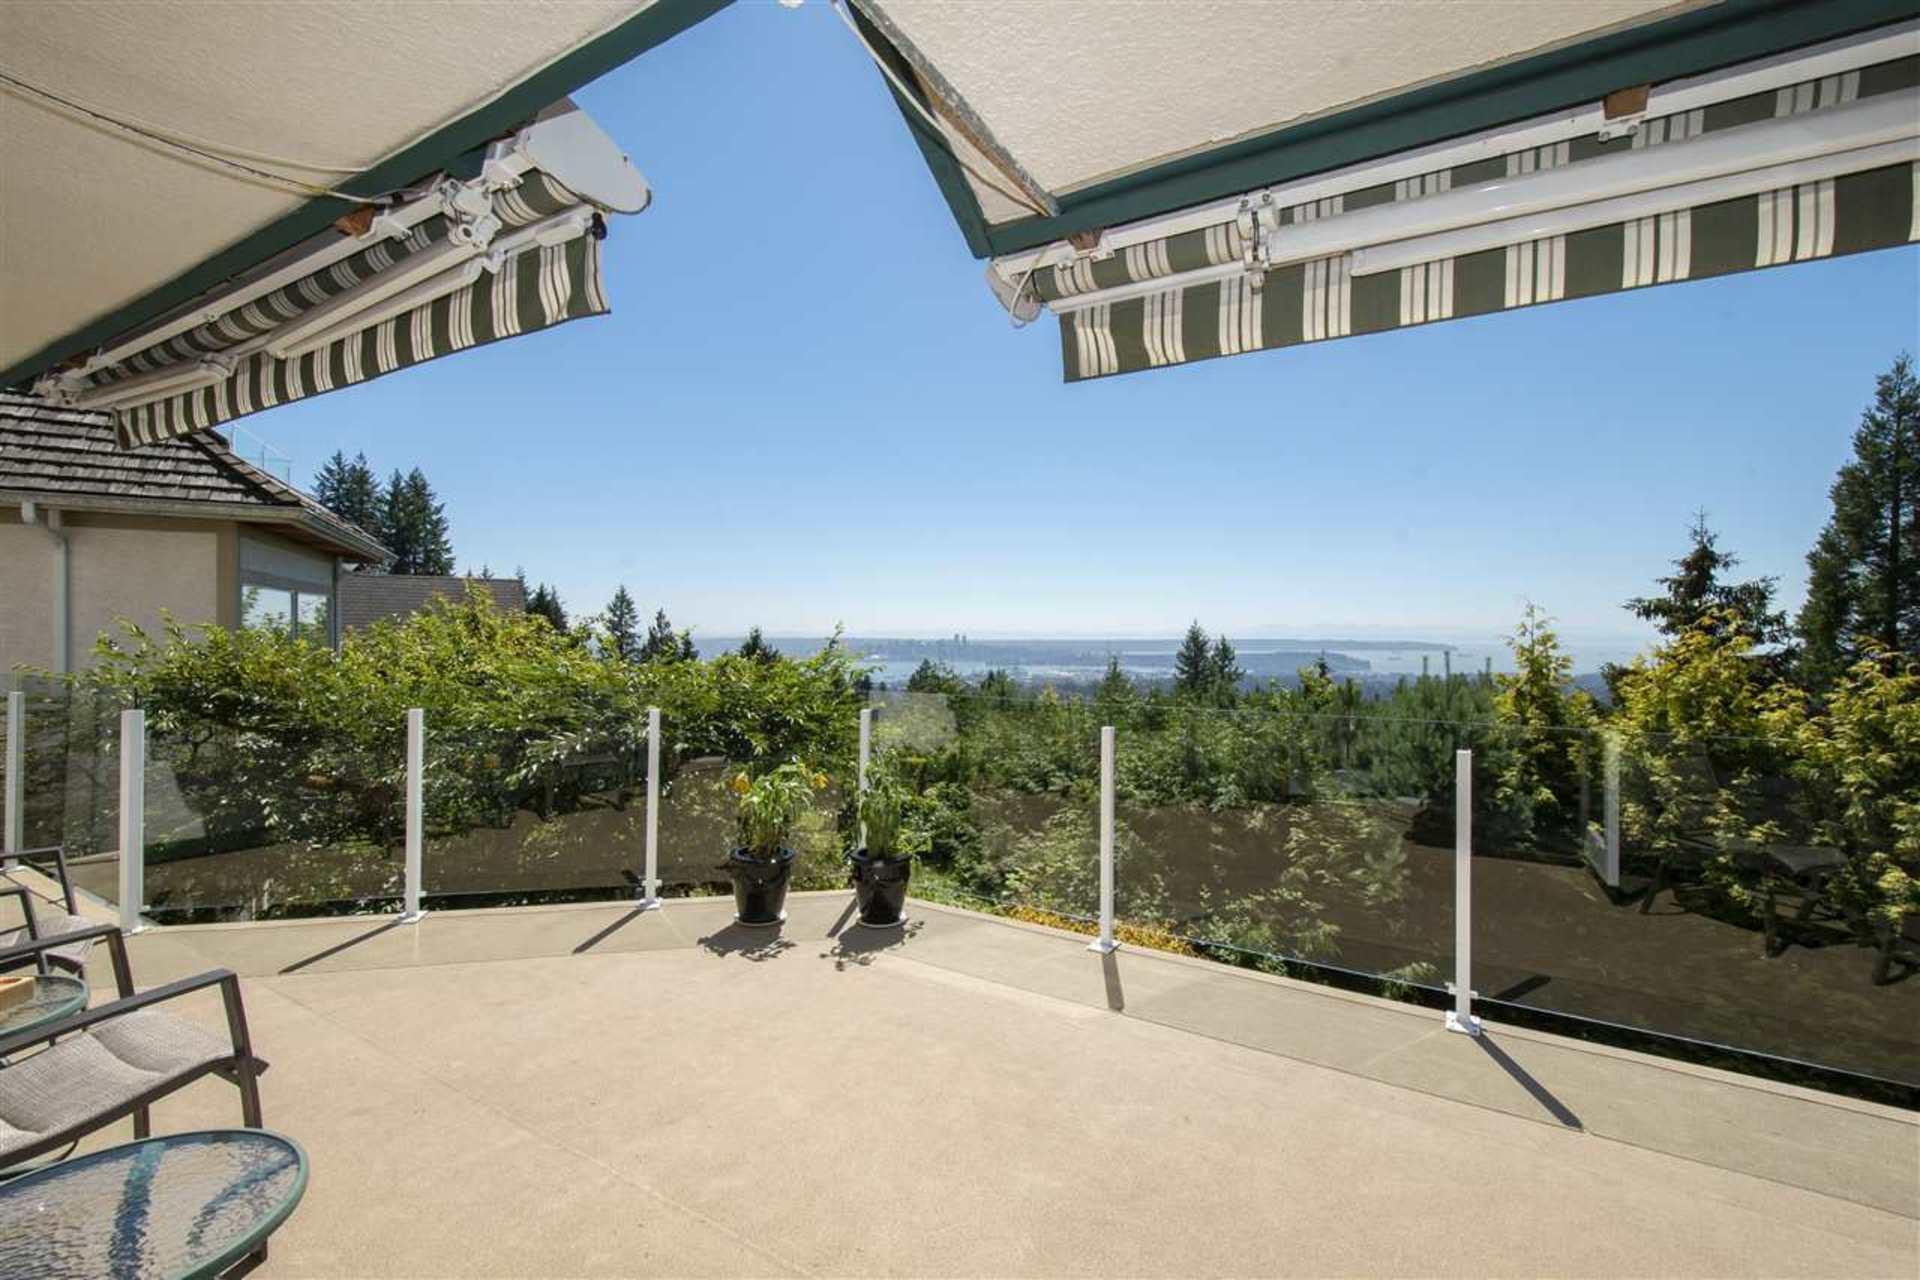 4285-prospect-road-upper-delbrook-north-vancouver-13 at 4285 Prospect Road, Upper Delbrook, North Vancouver